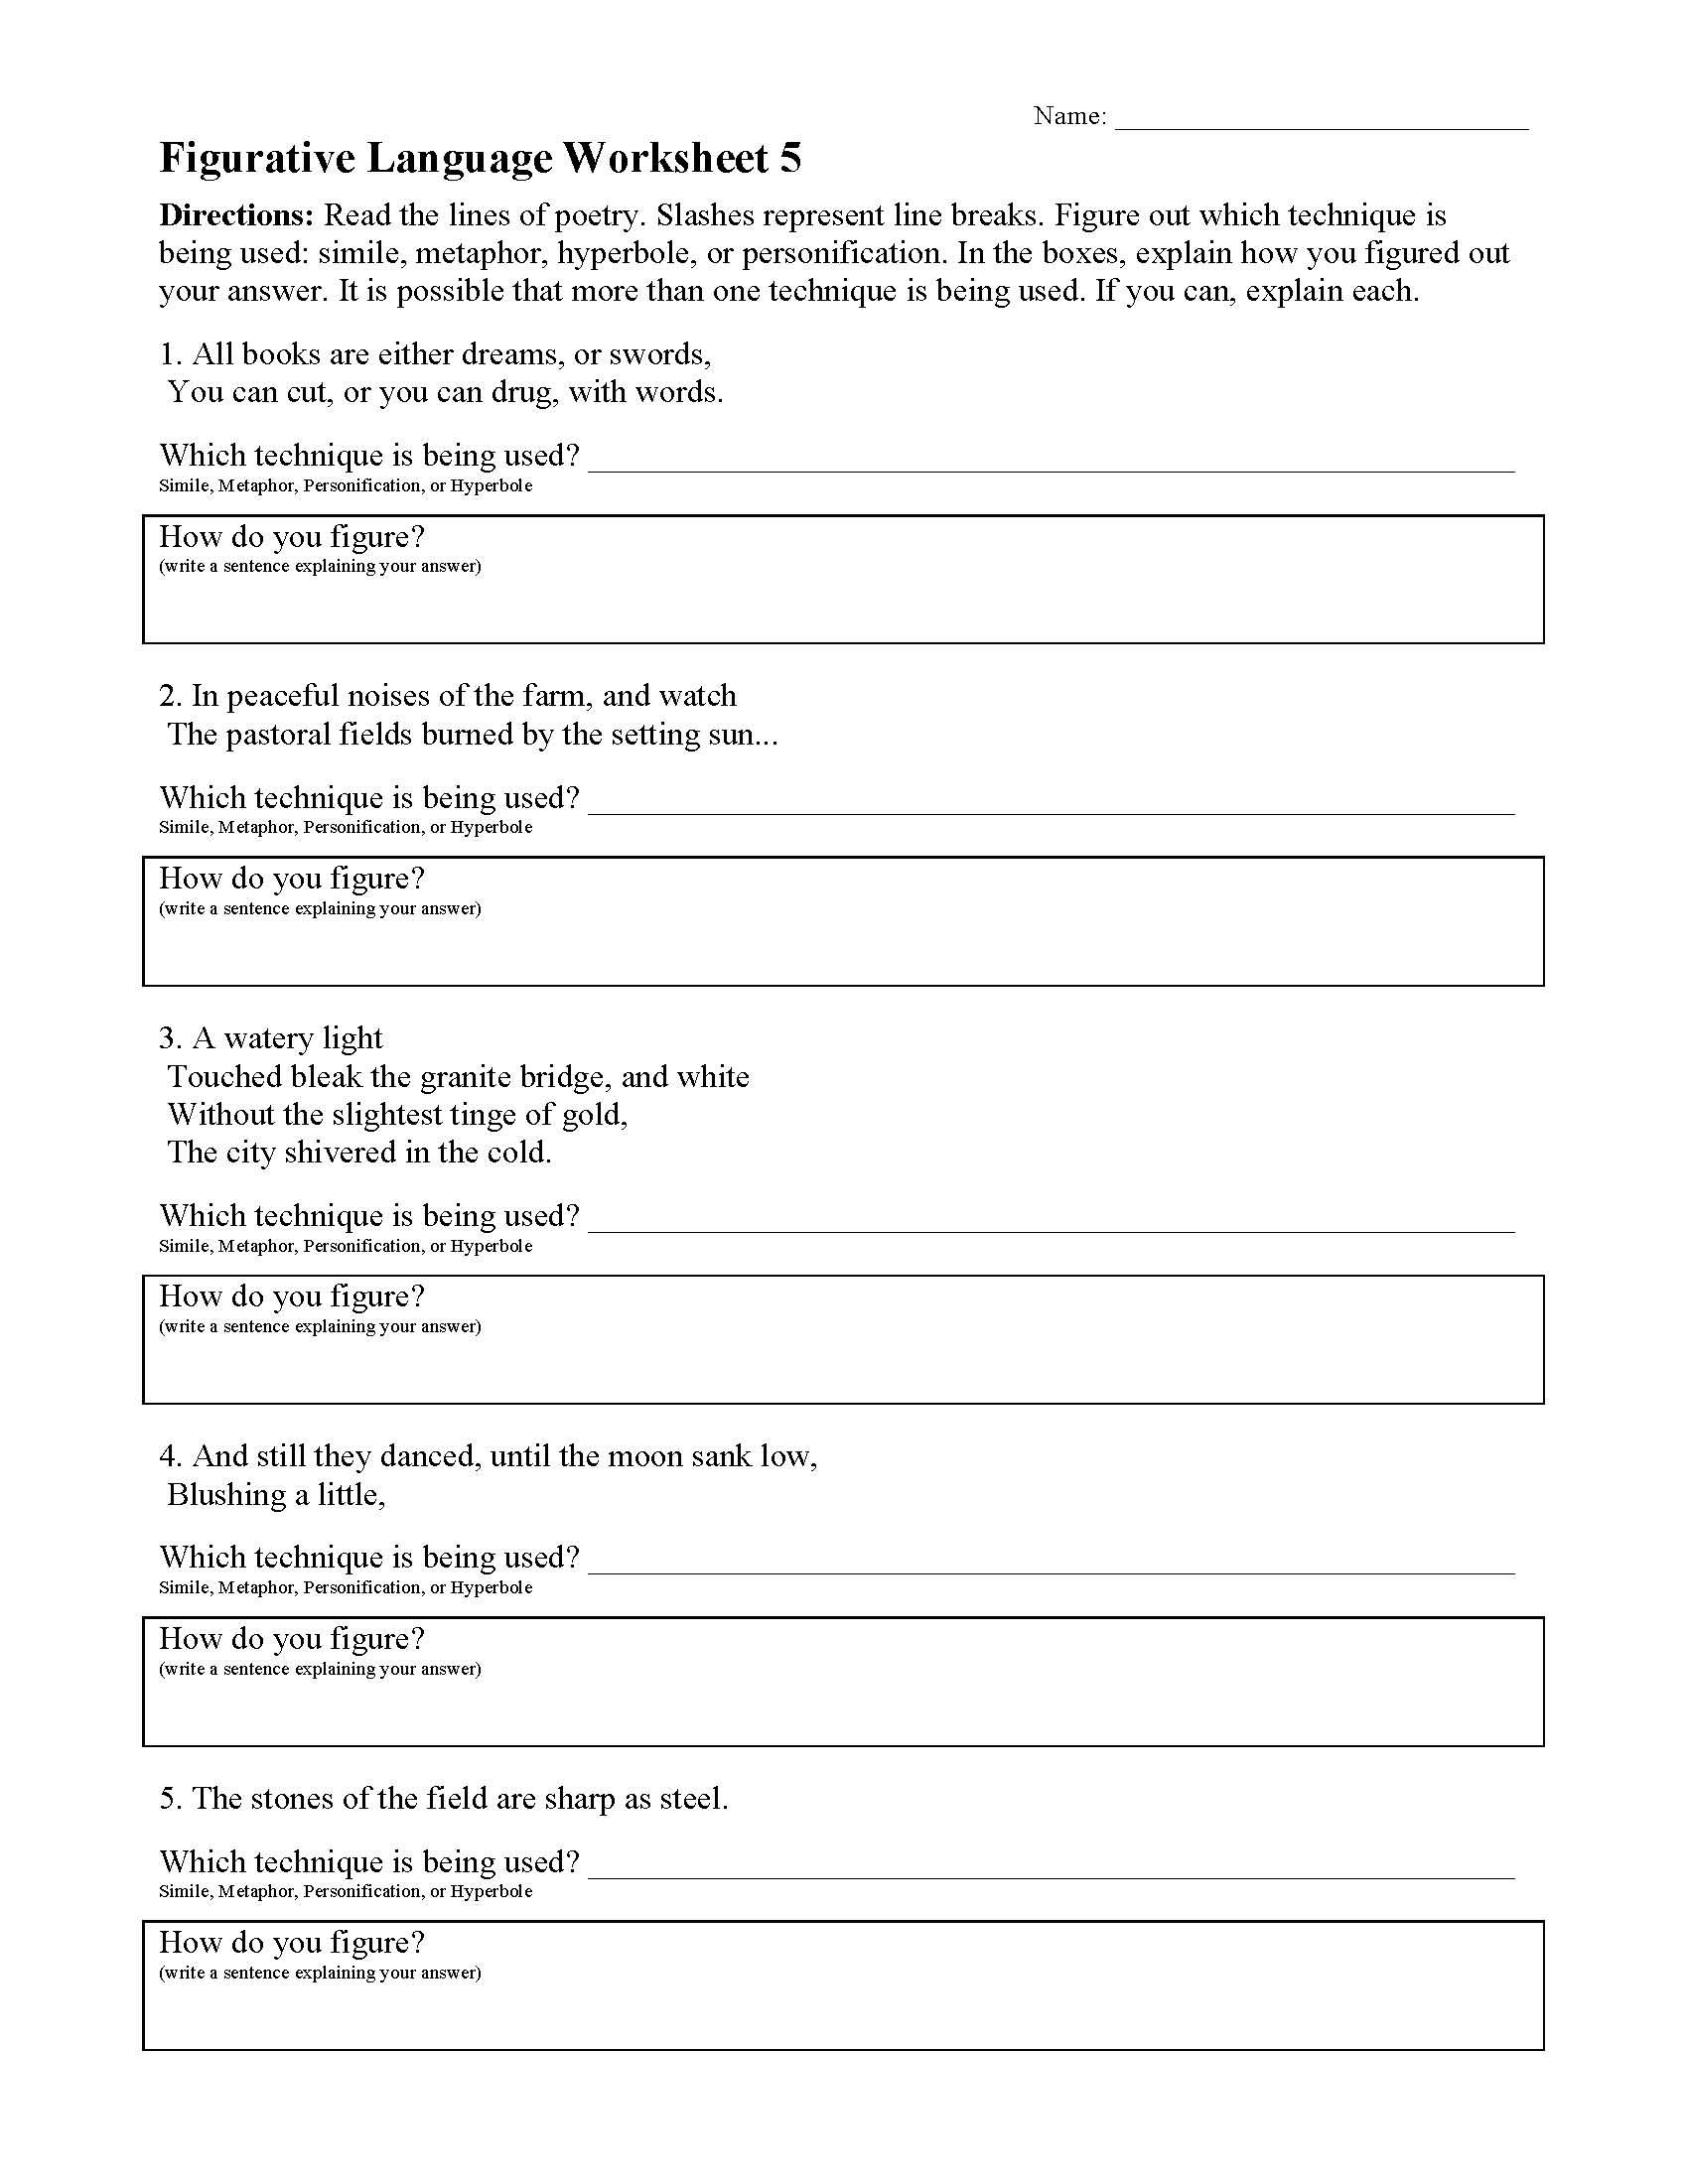 Figurative Language Worksheet 5 Preview